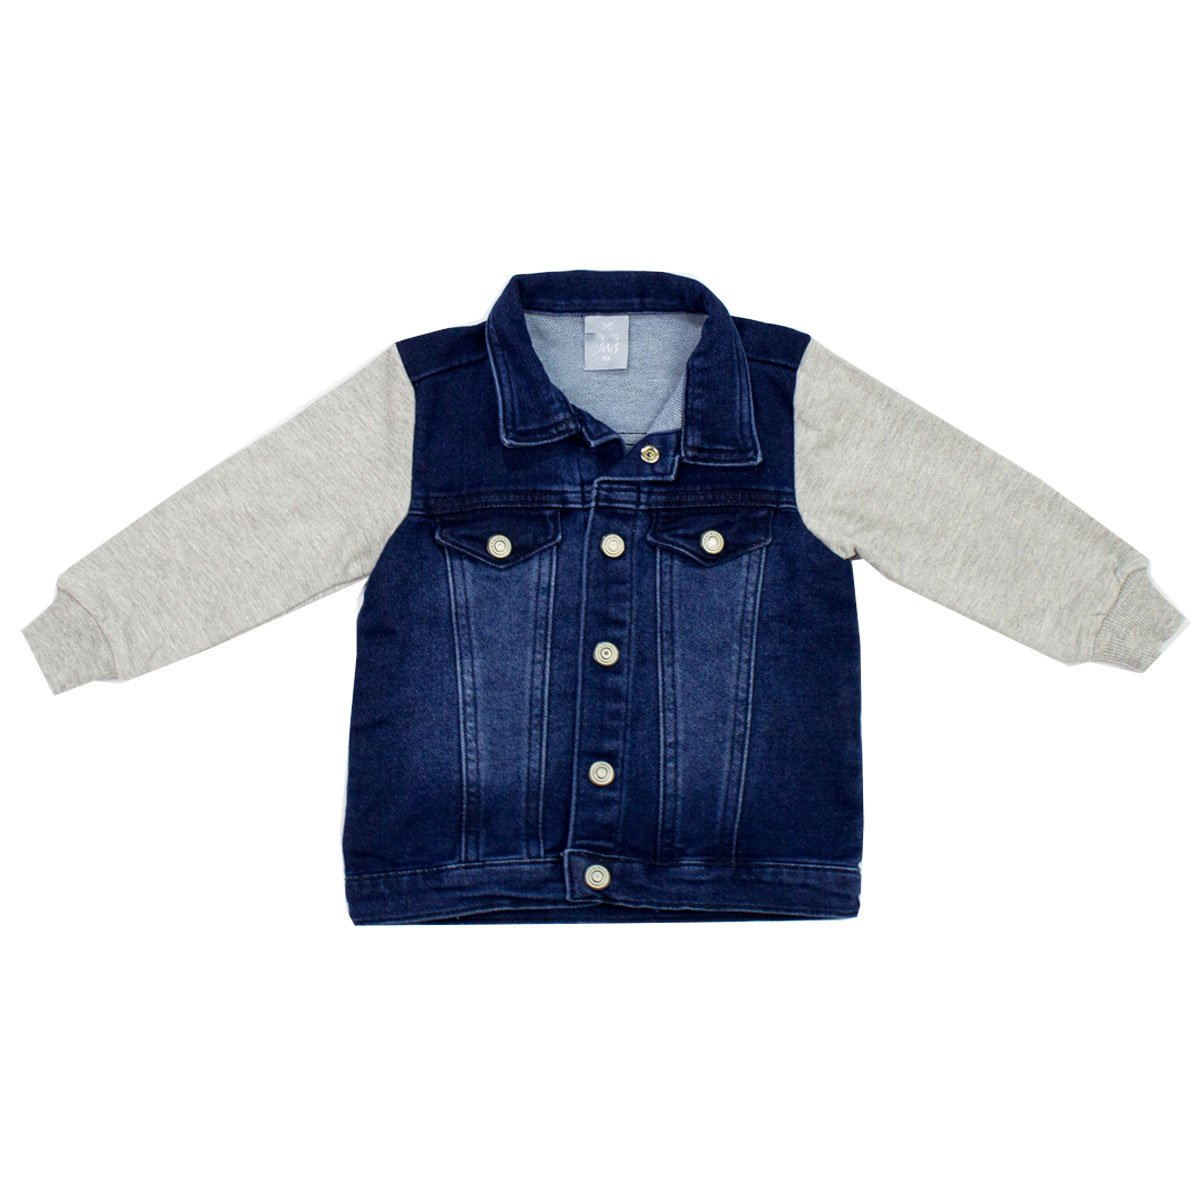 bfeff65b2 Bizz Store - Jaqueta Jeans Infantil Bebê Hering Kids Moletom